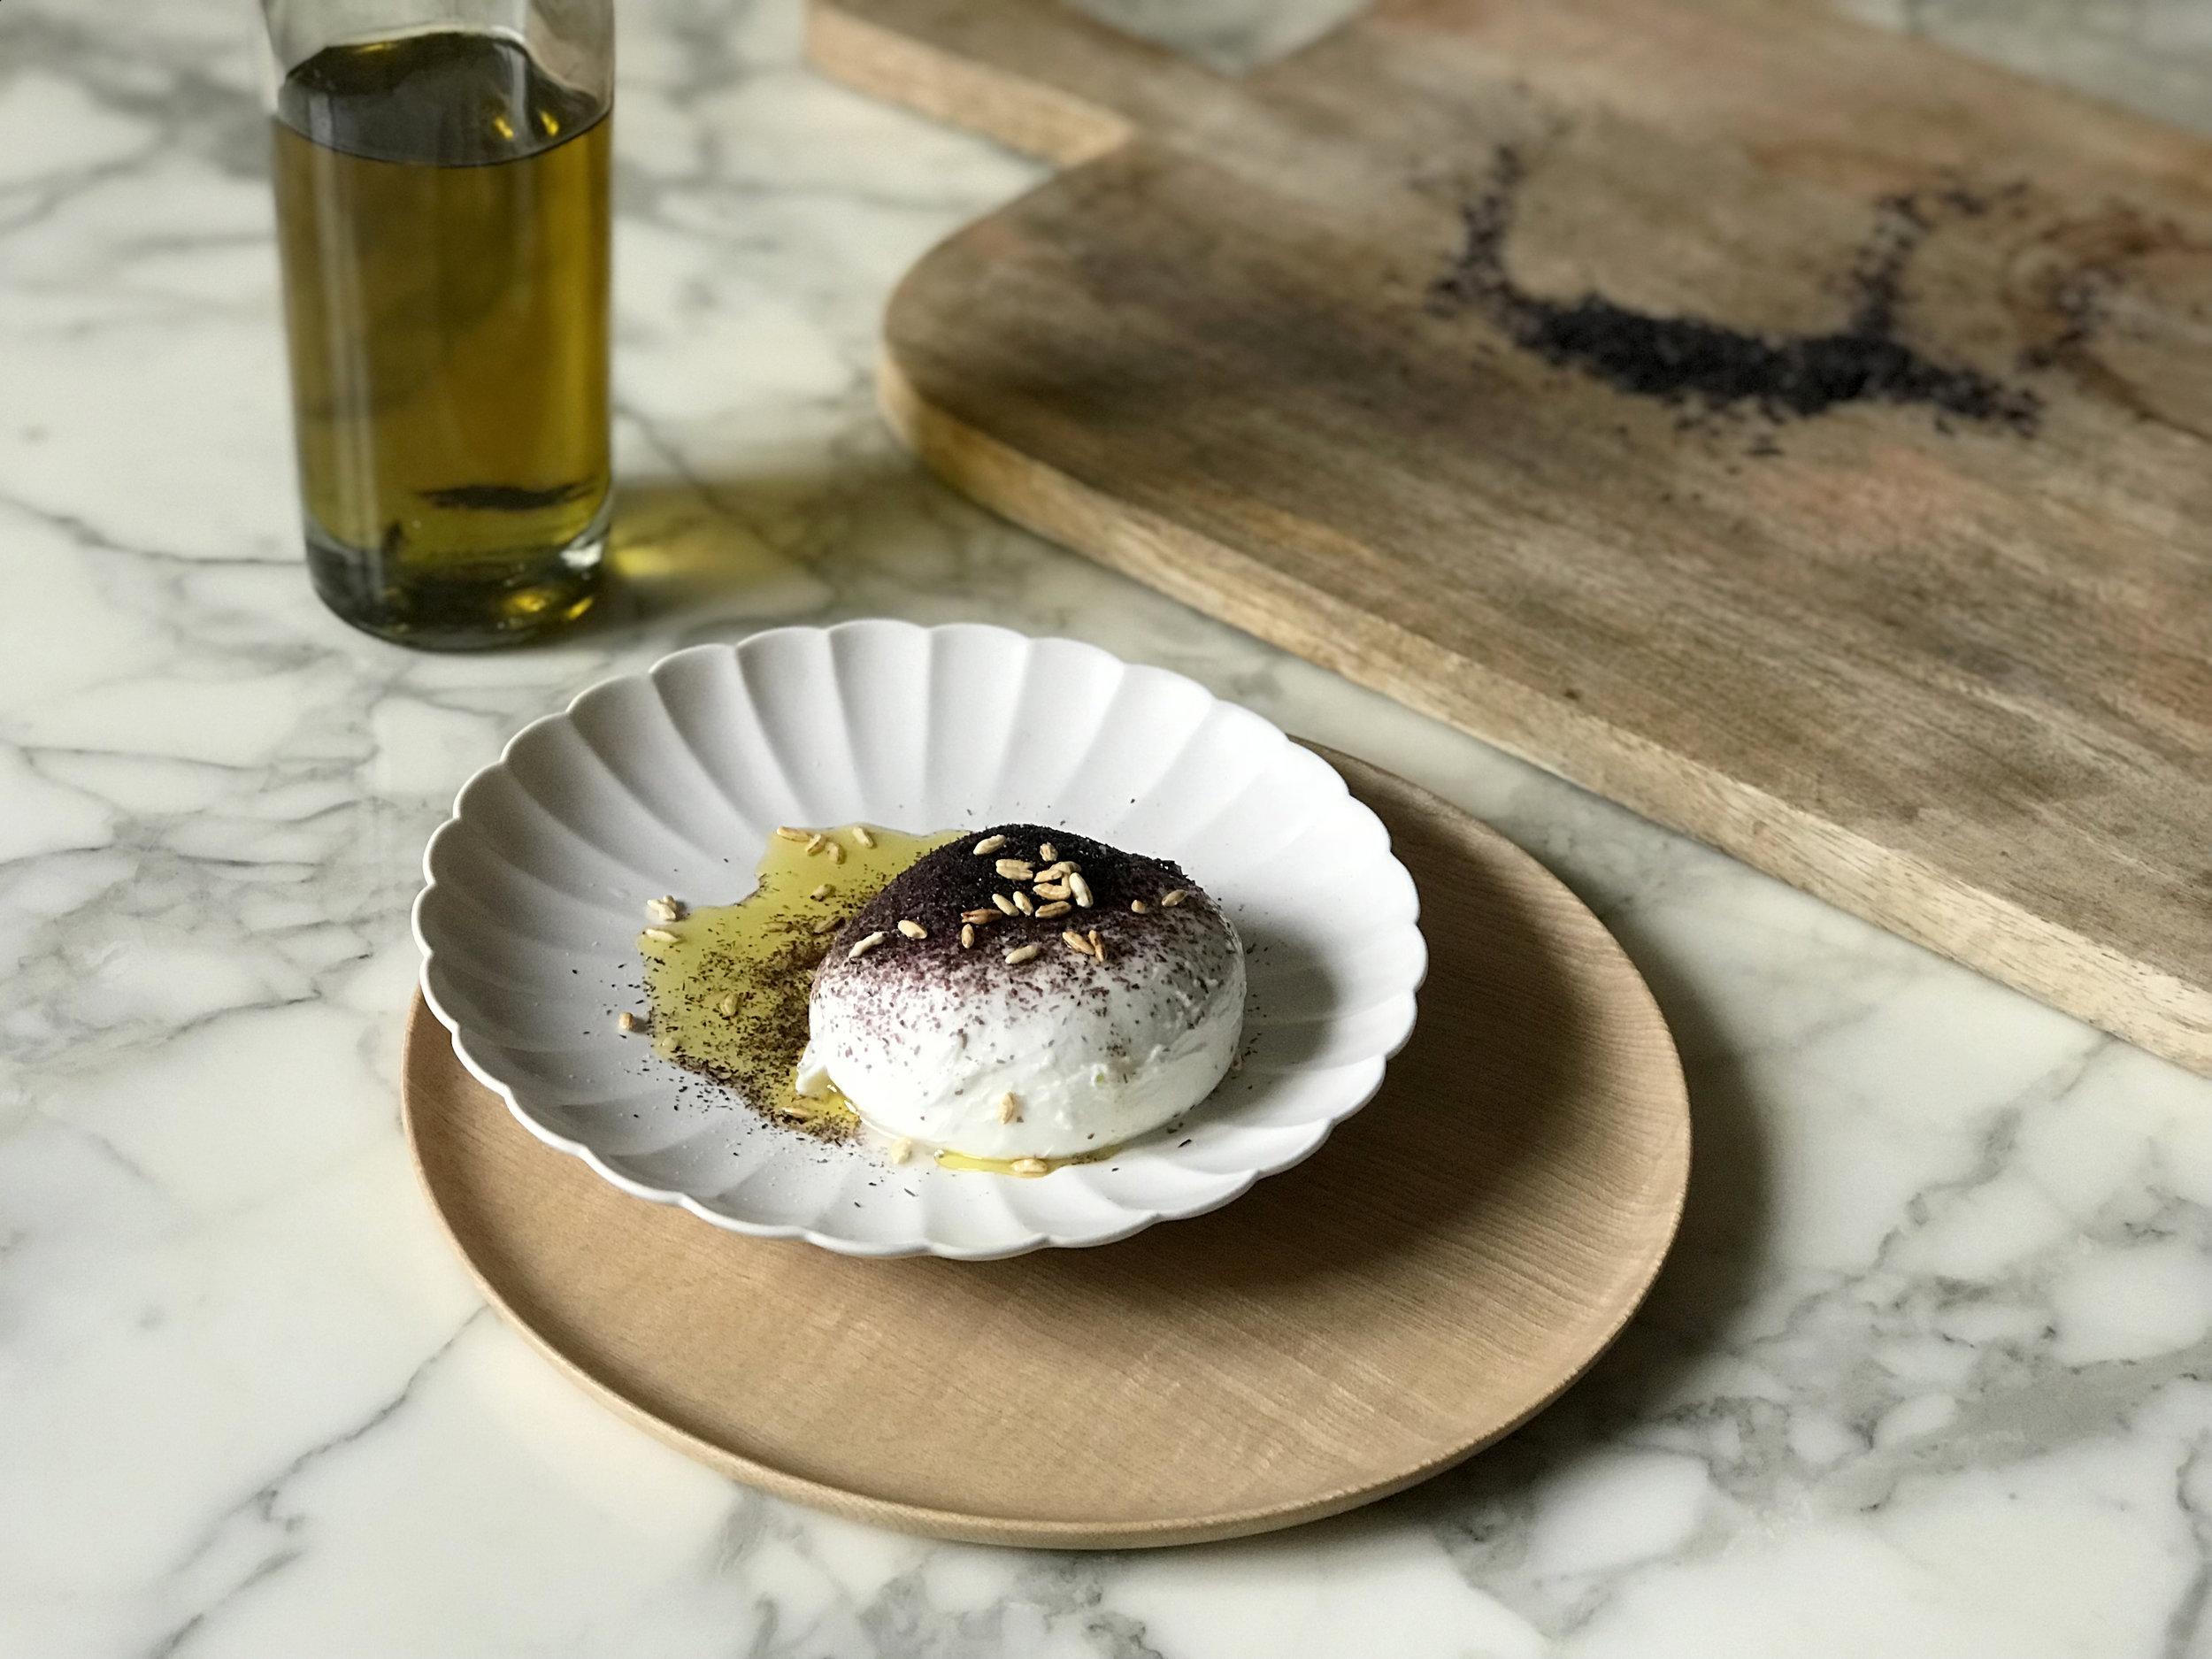 China Kiku plate and Soji wooden plate from  Shopu .